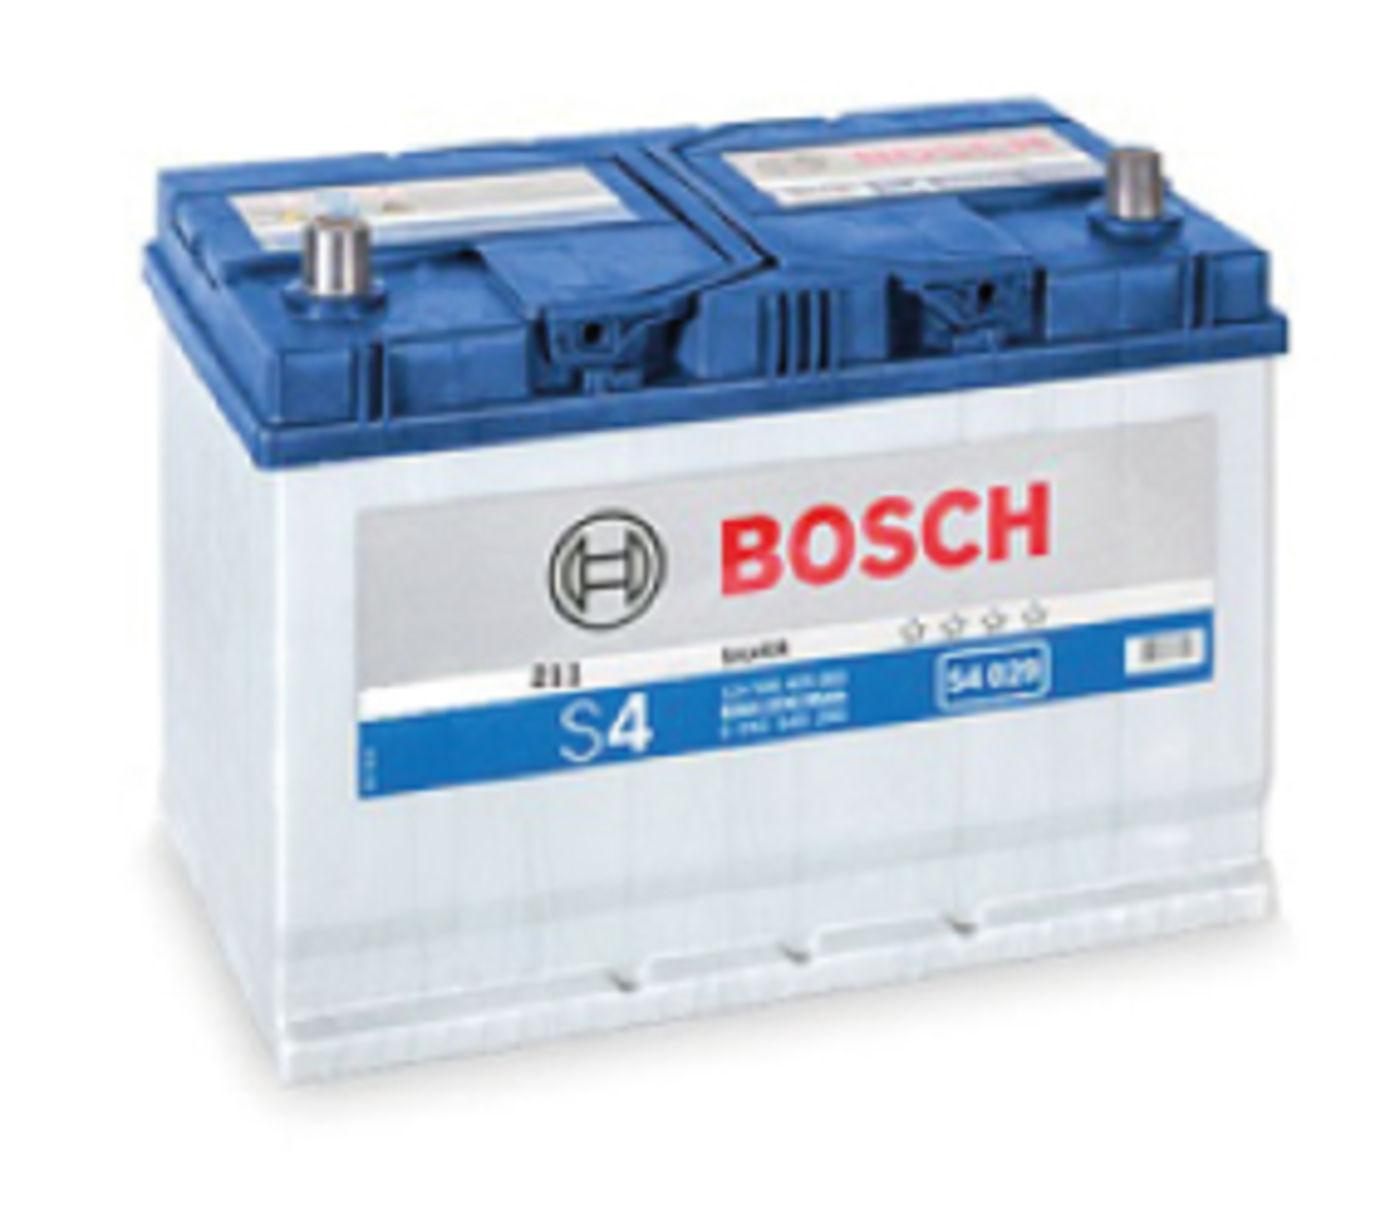 Bosch 65 FE LM